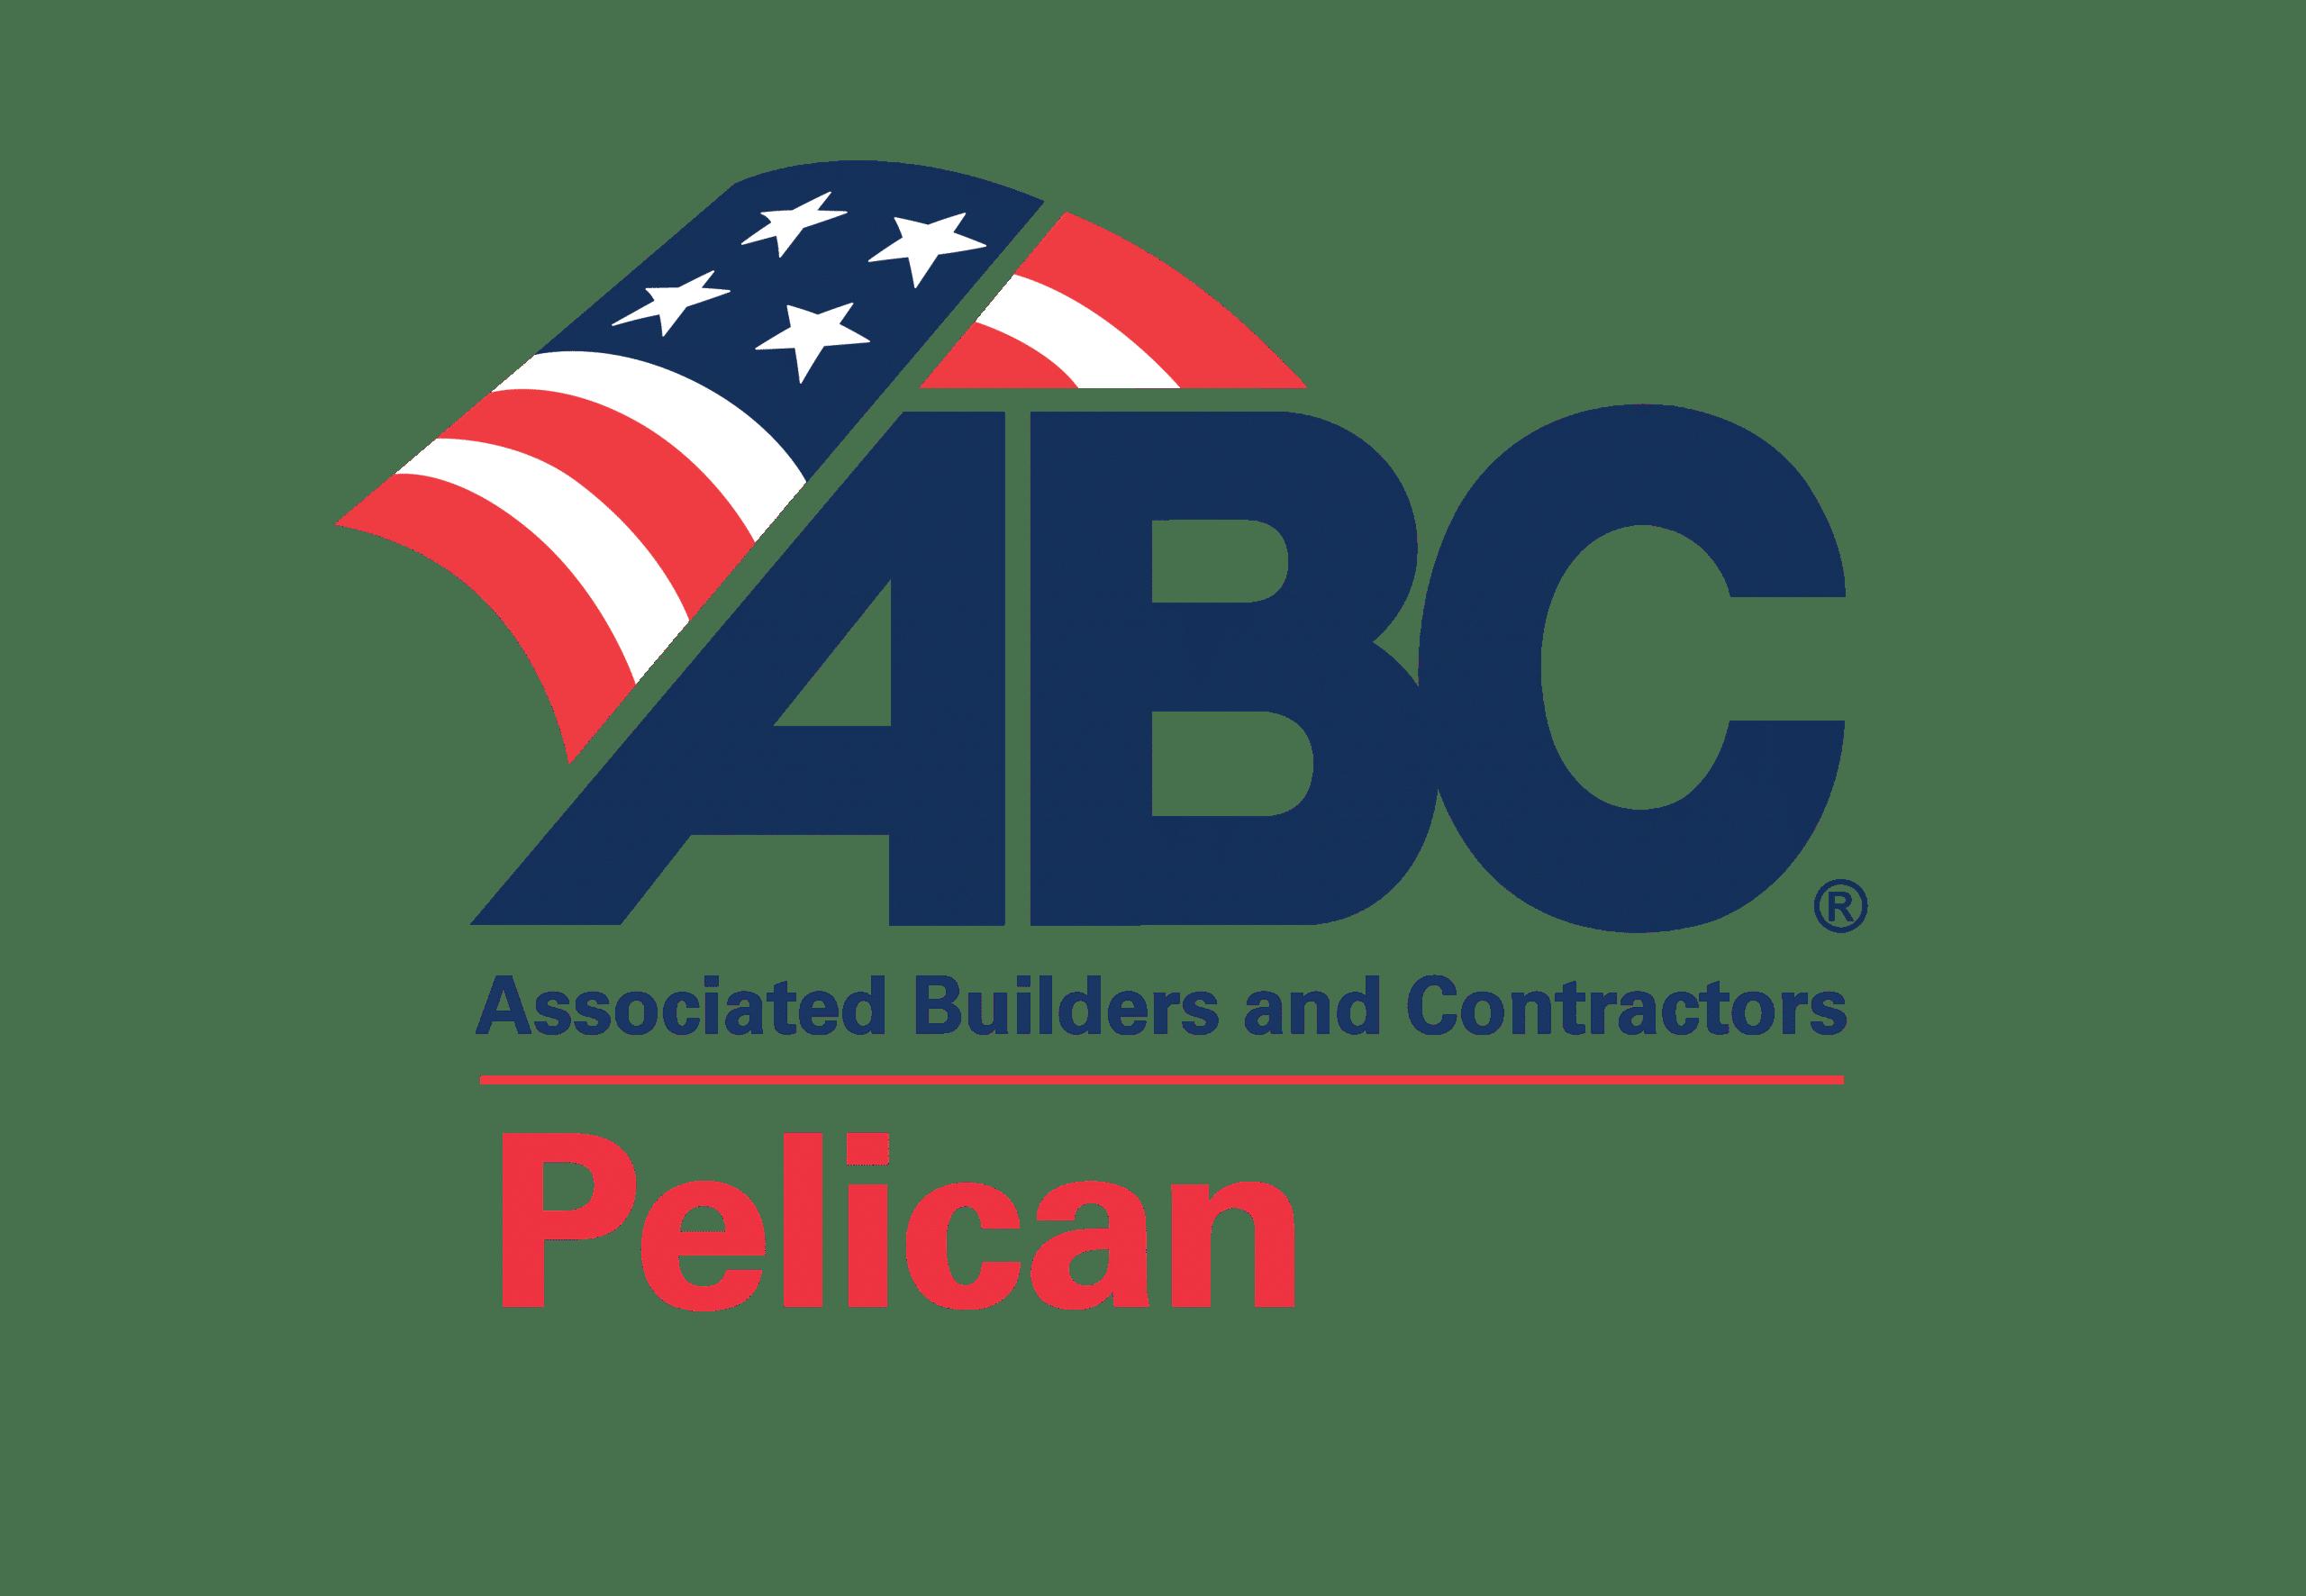 ABC pelican logo